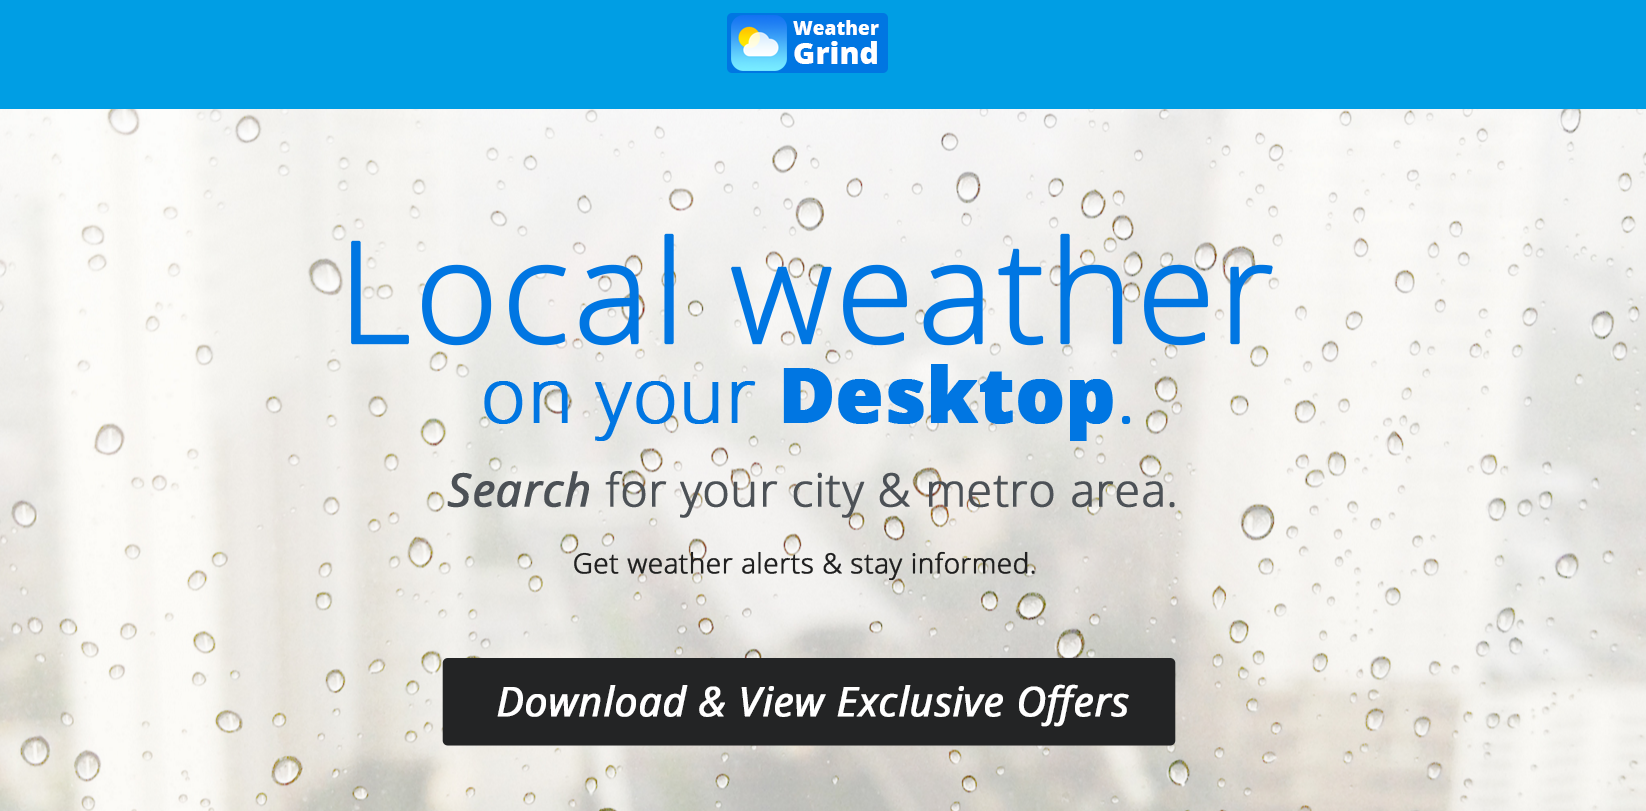 Weather Grind Ads